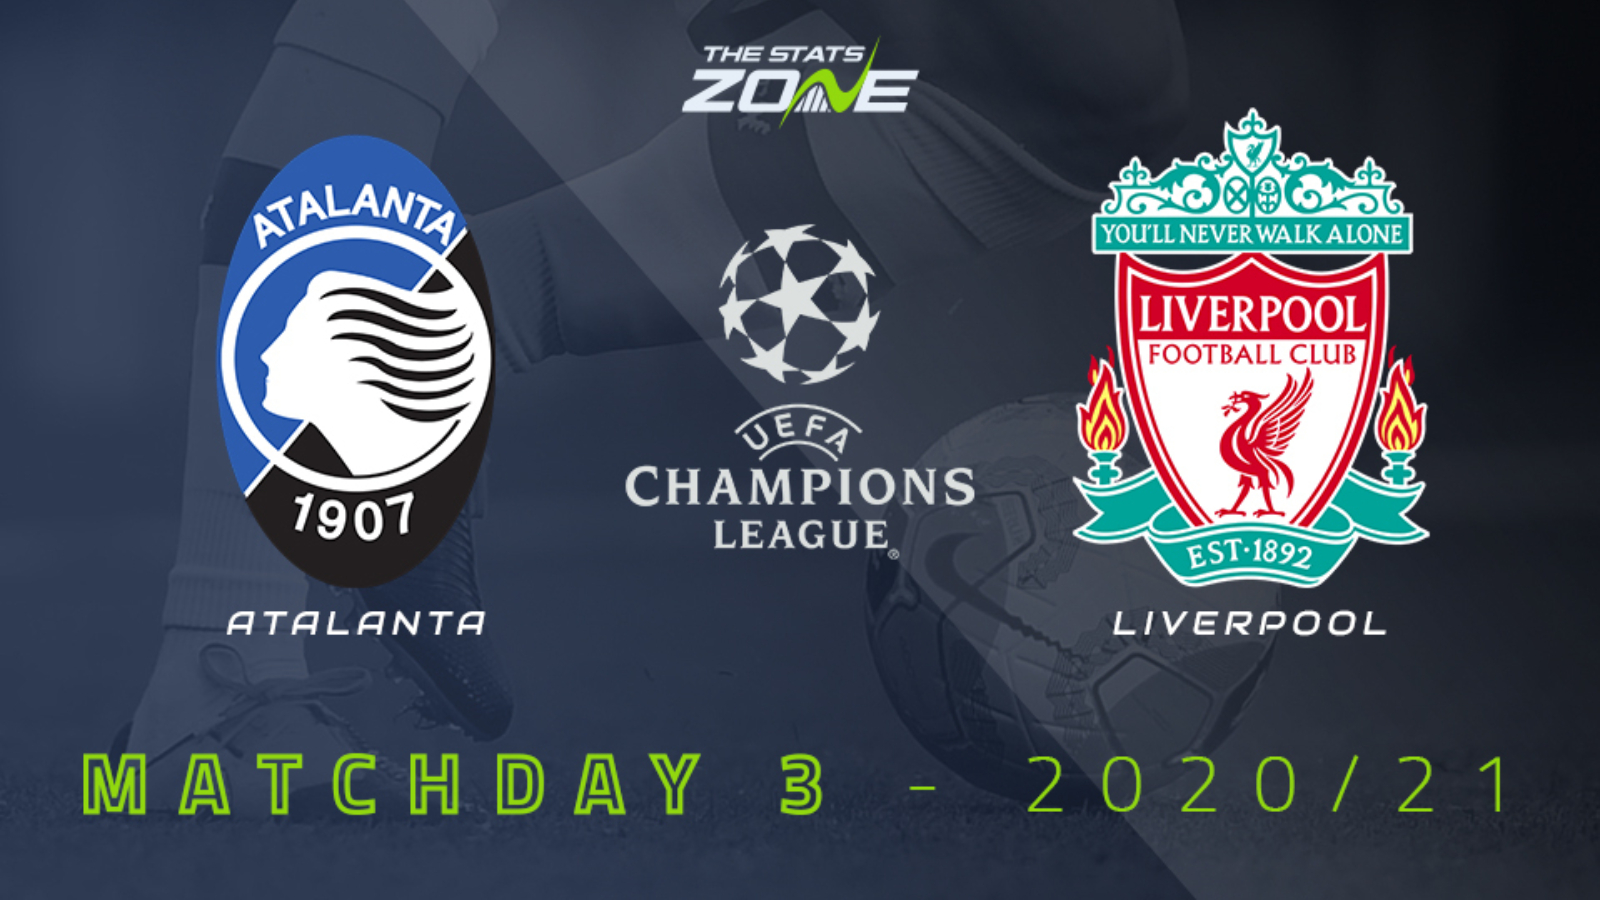 2020 21 uefa champions league atalanta vs liverpool preview prediction the stats zone the stats zone